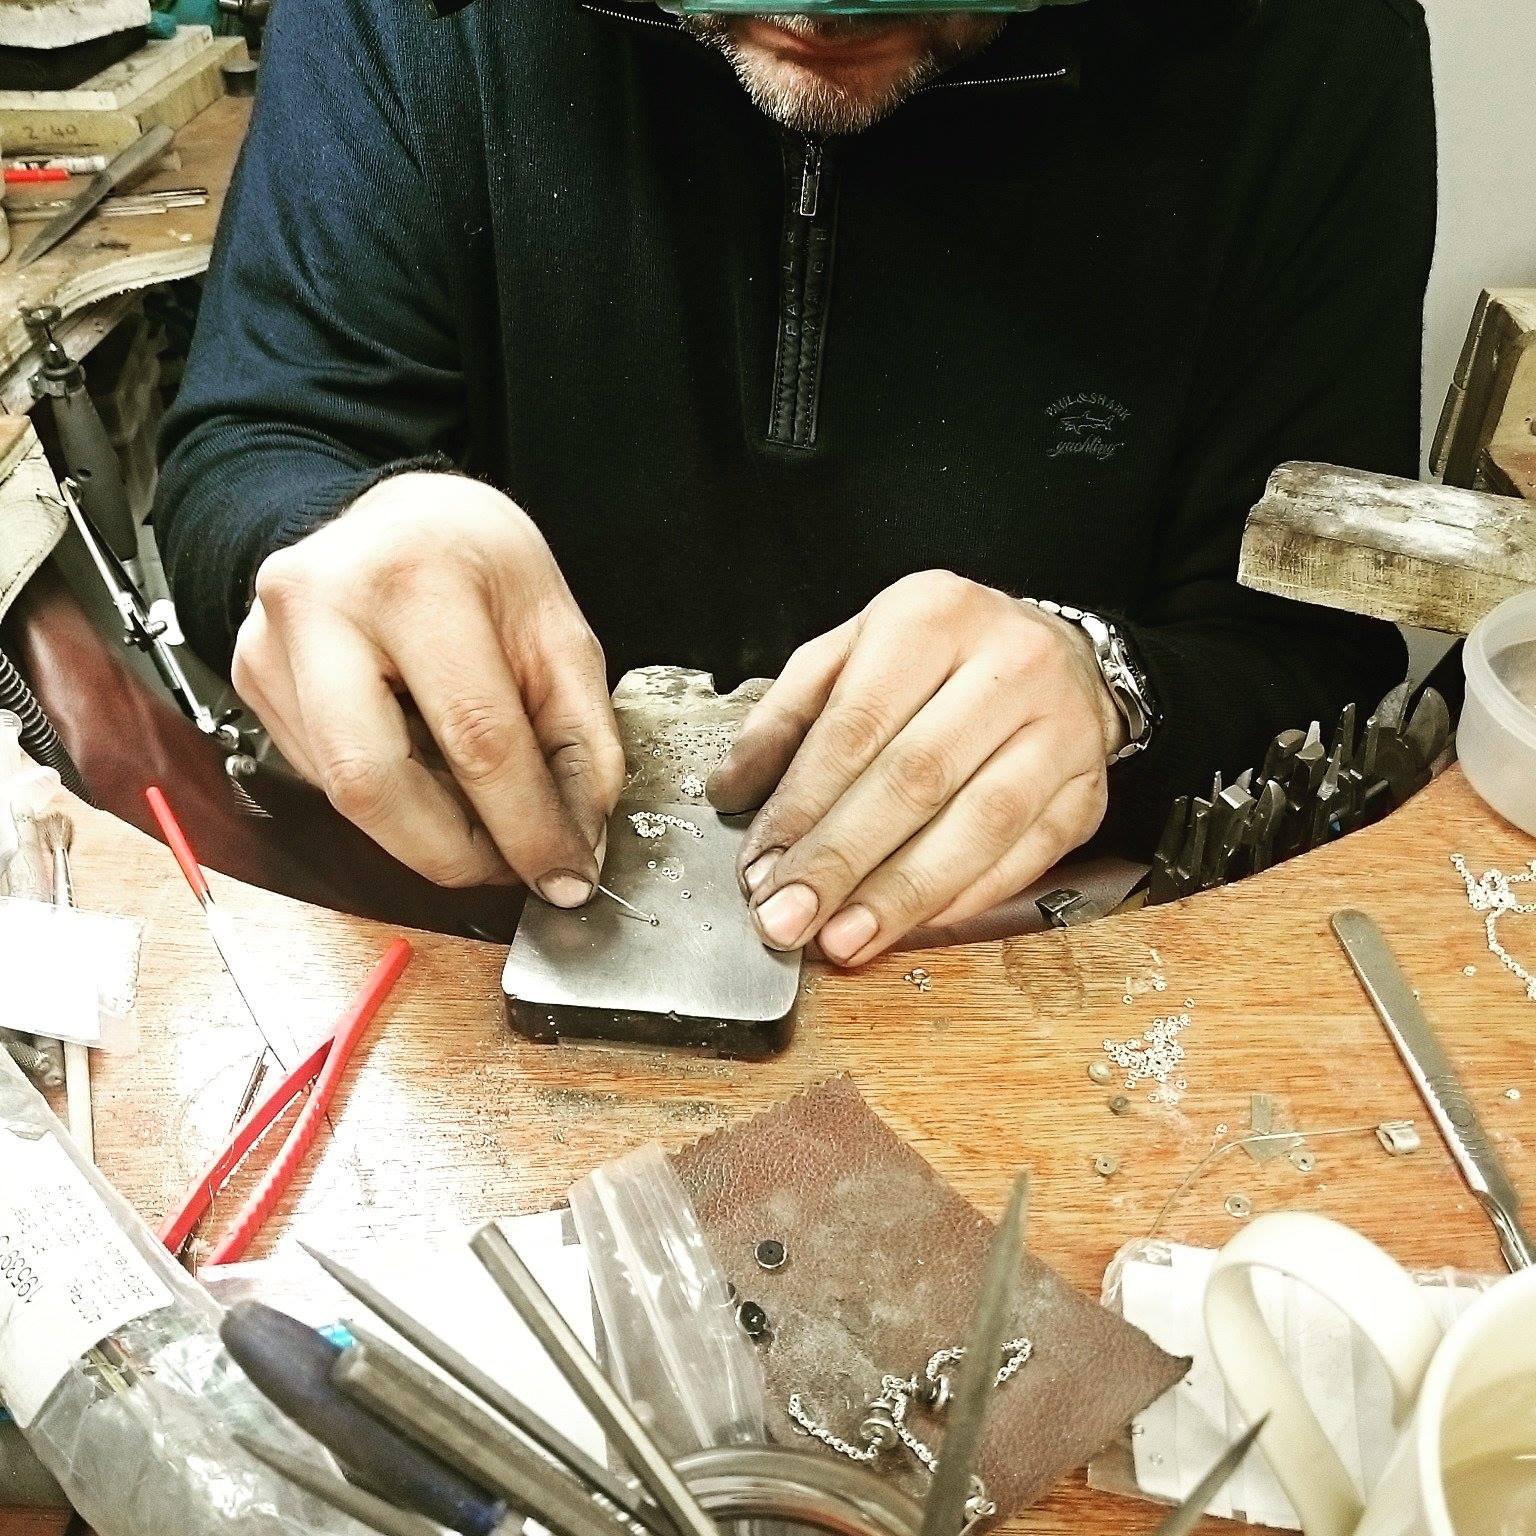 Handmade Bespoke Jewellery by LuLu & Charles, Serving County Durham, Newcastle & Northumberland, UK